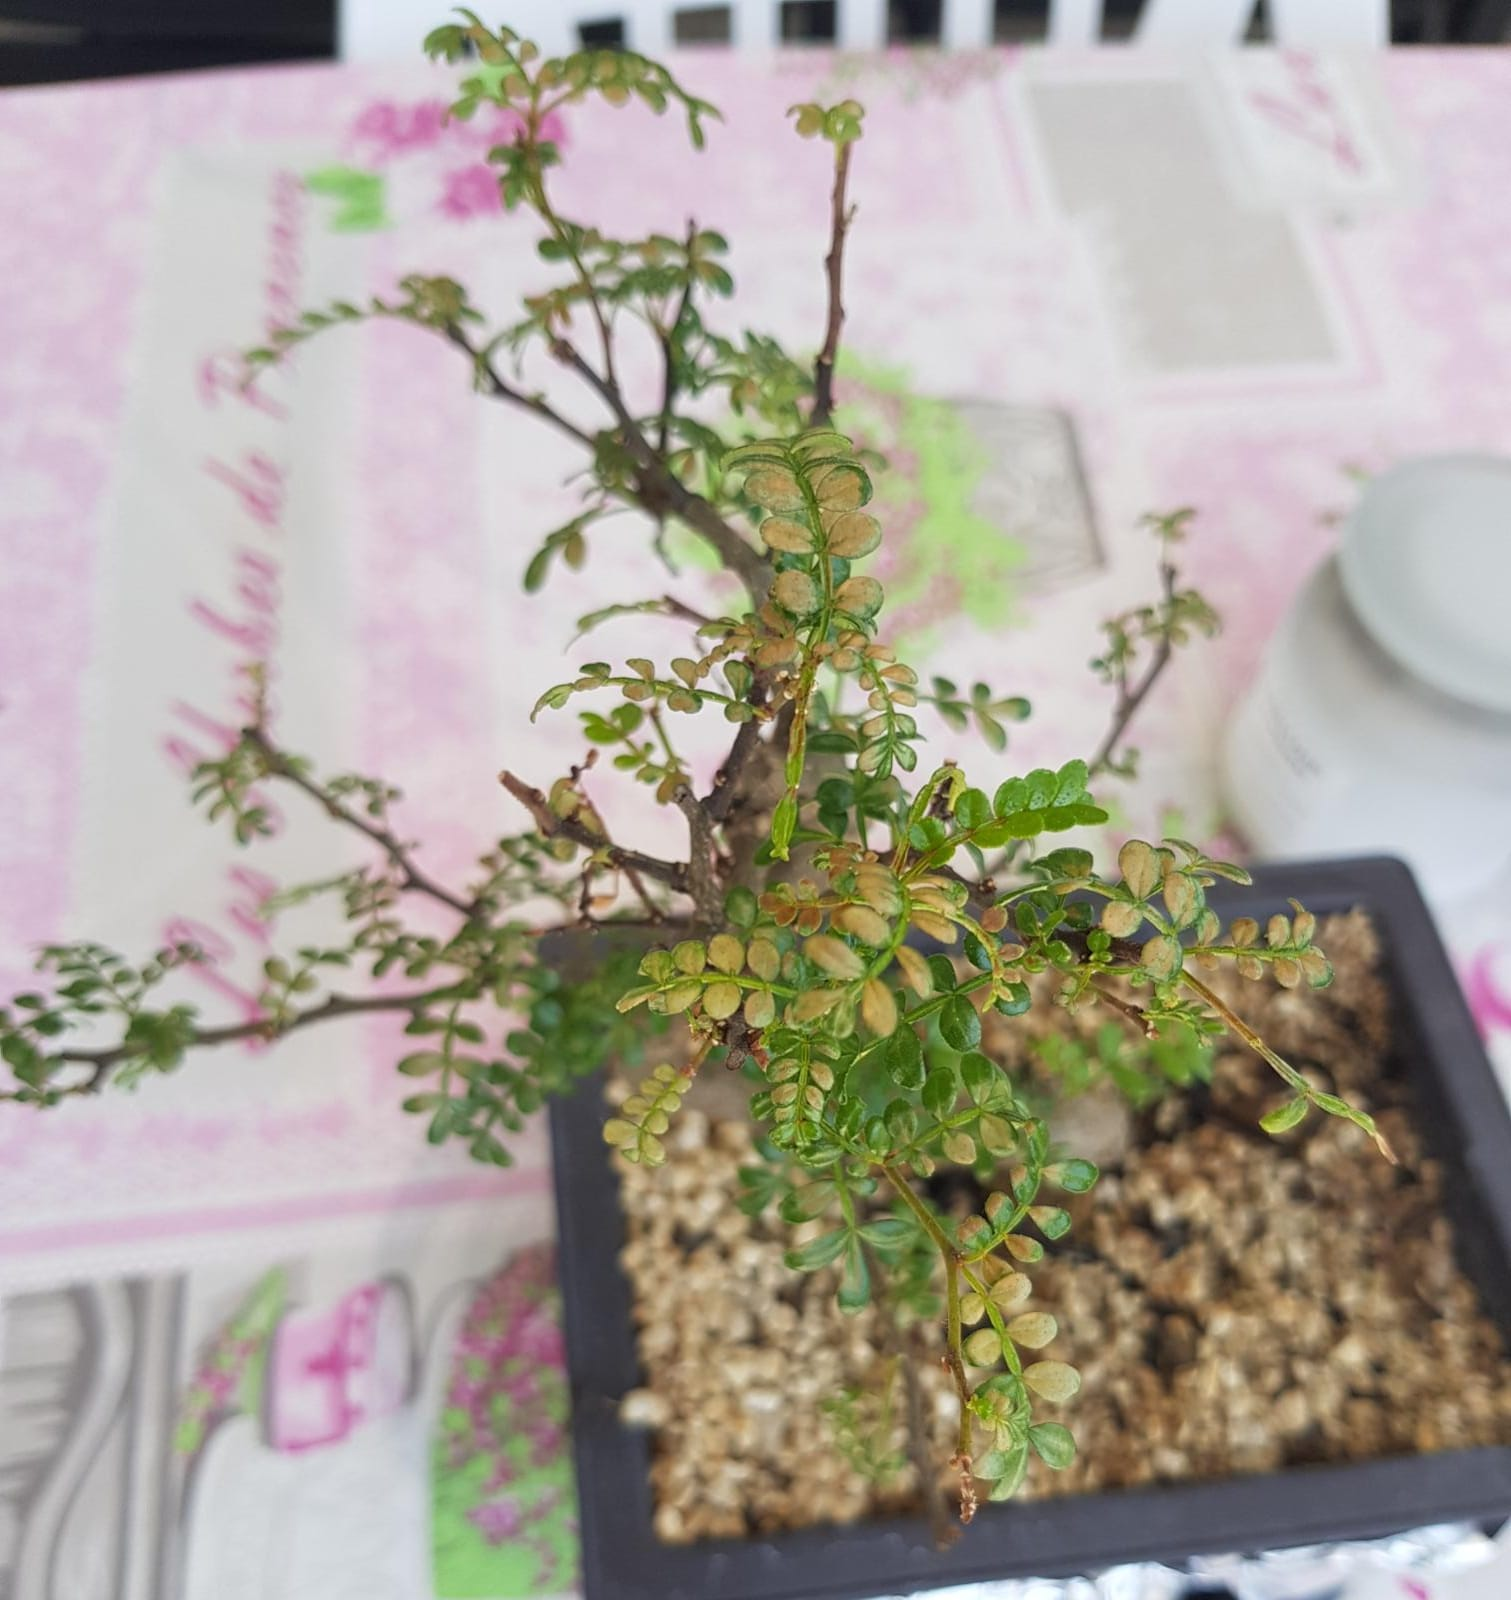 primo bonsai pepper tree: chiedo consigli - Pagina 3 WhatsApp-Image-2020-05-27-at-14.26.13-4